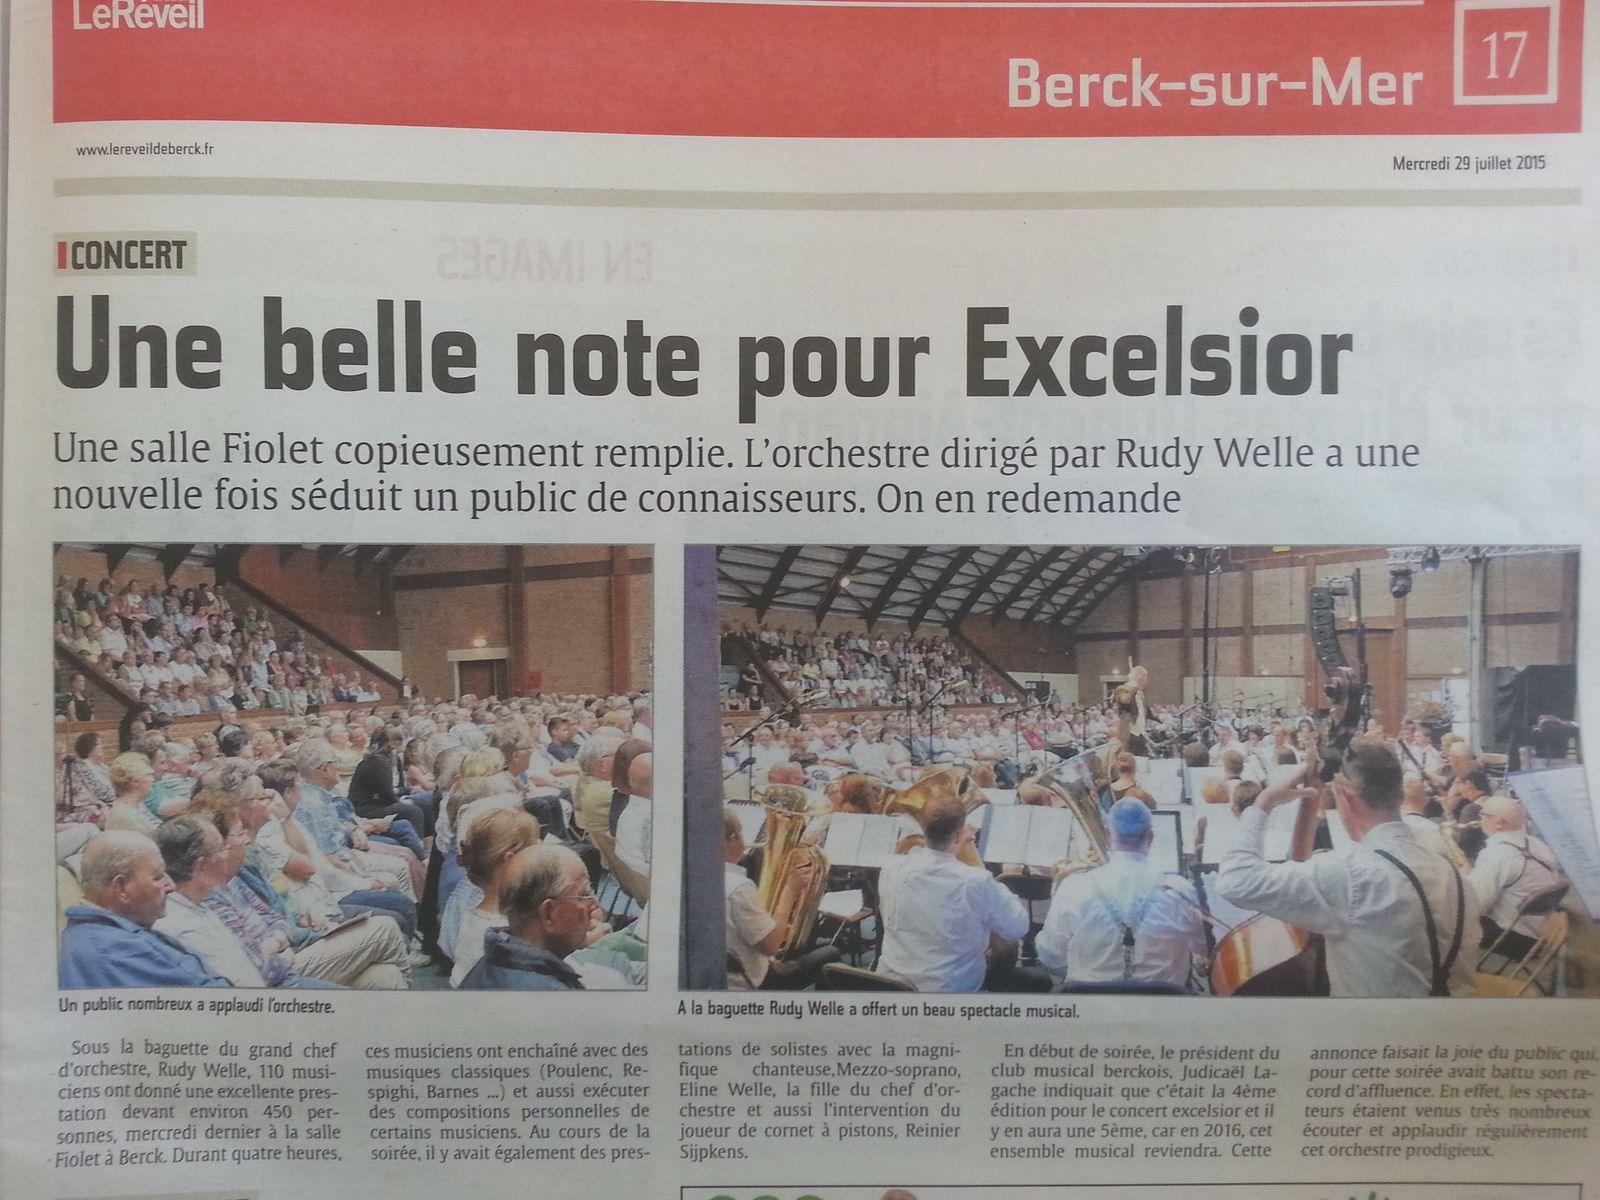 Excelsior 2015 à Berck sur Mer